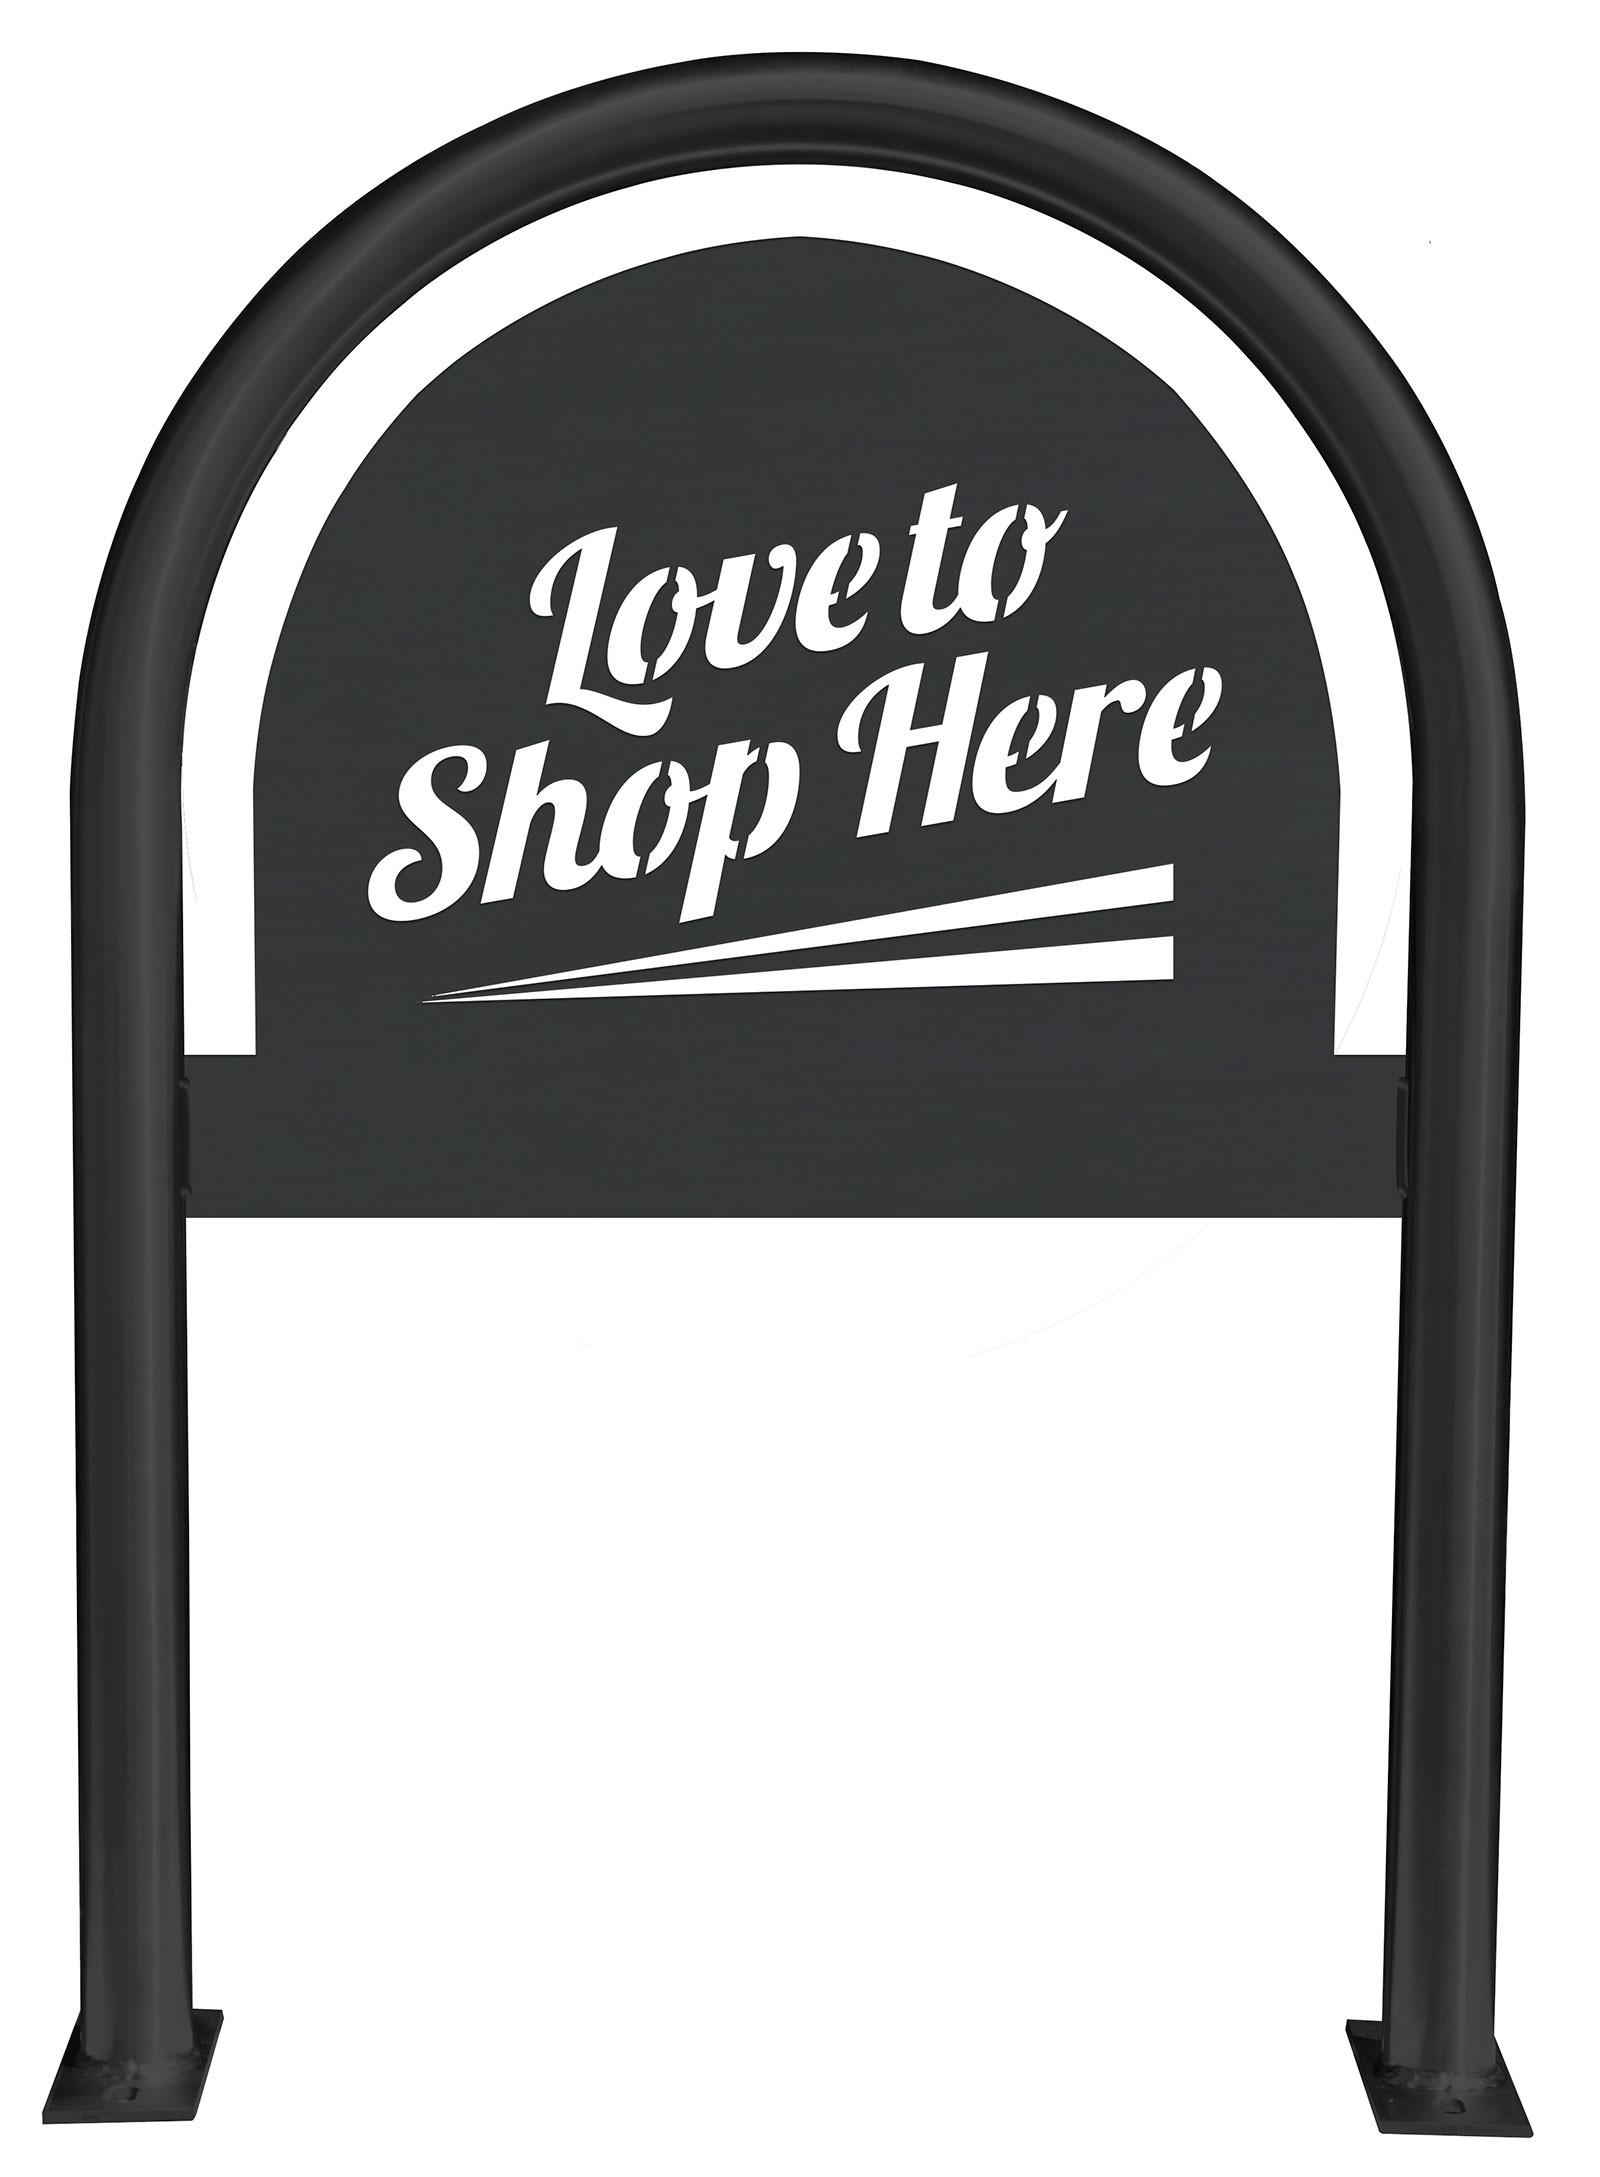 Love to Shop Here Laser Cut Panel Themed Bike Rack